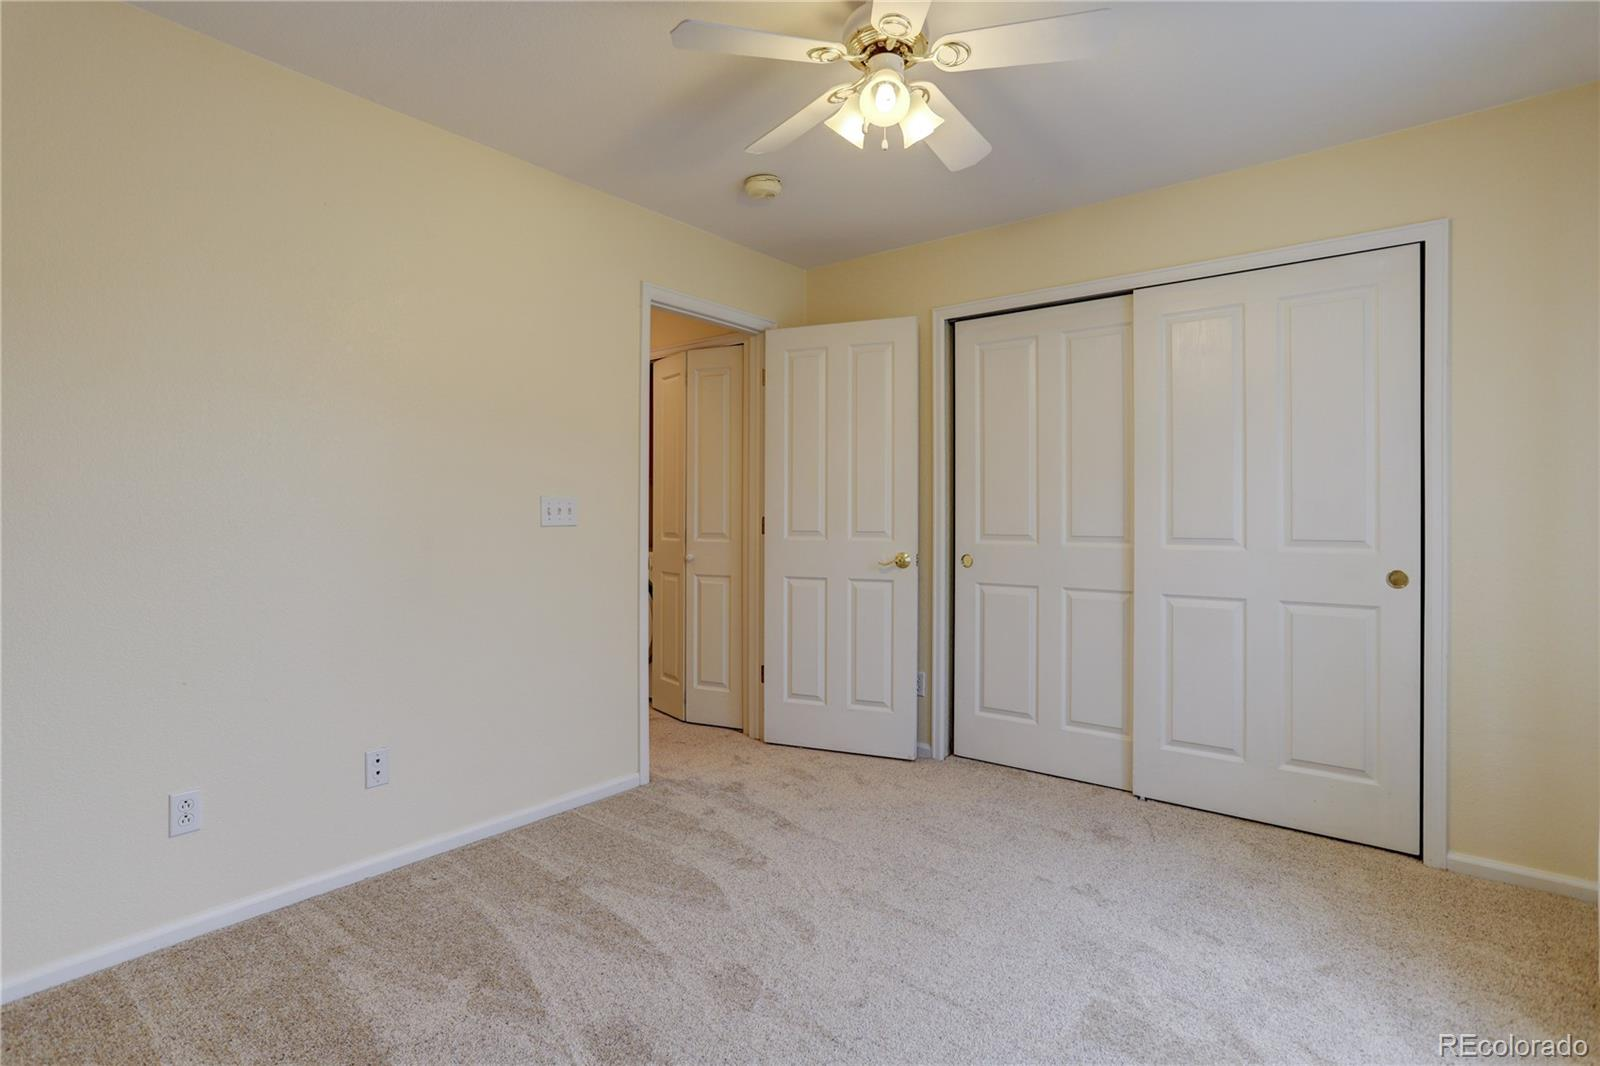 MLS# 2836182 - 20 - 7700 W Grant Ranch Boulevard #10D, Littleton, CO 80123